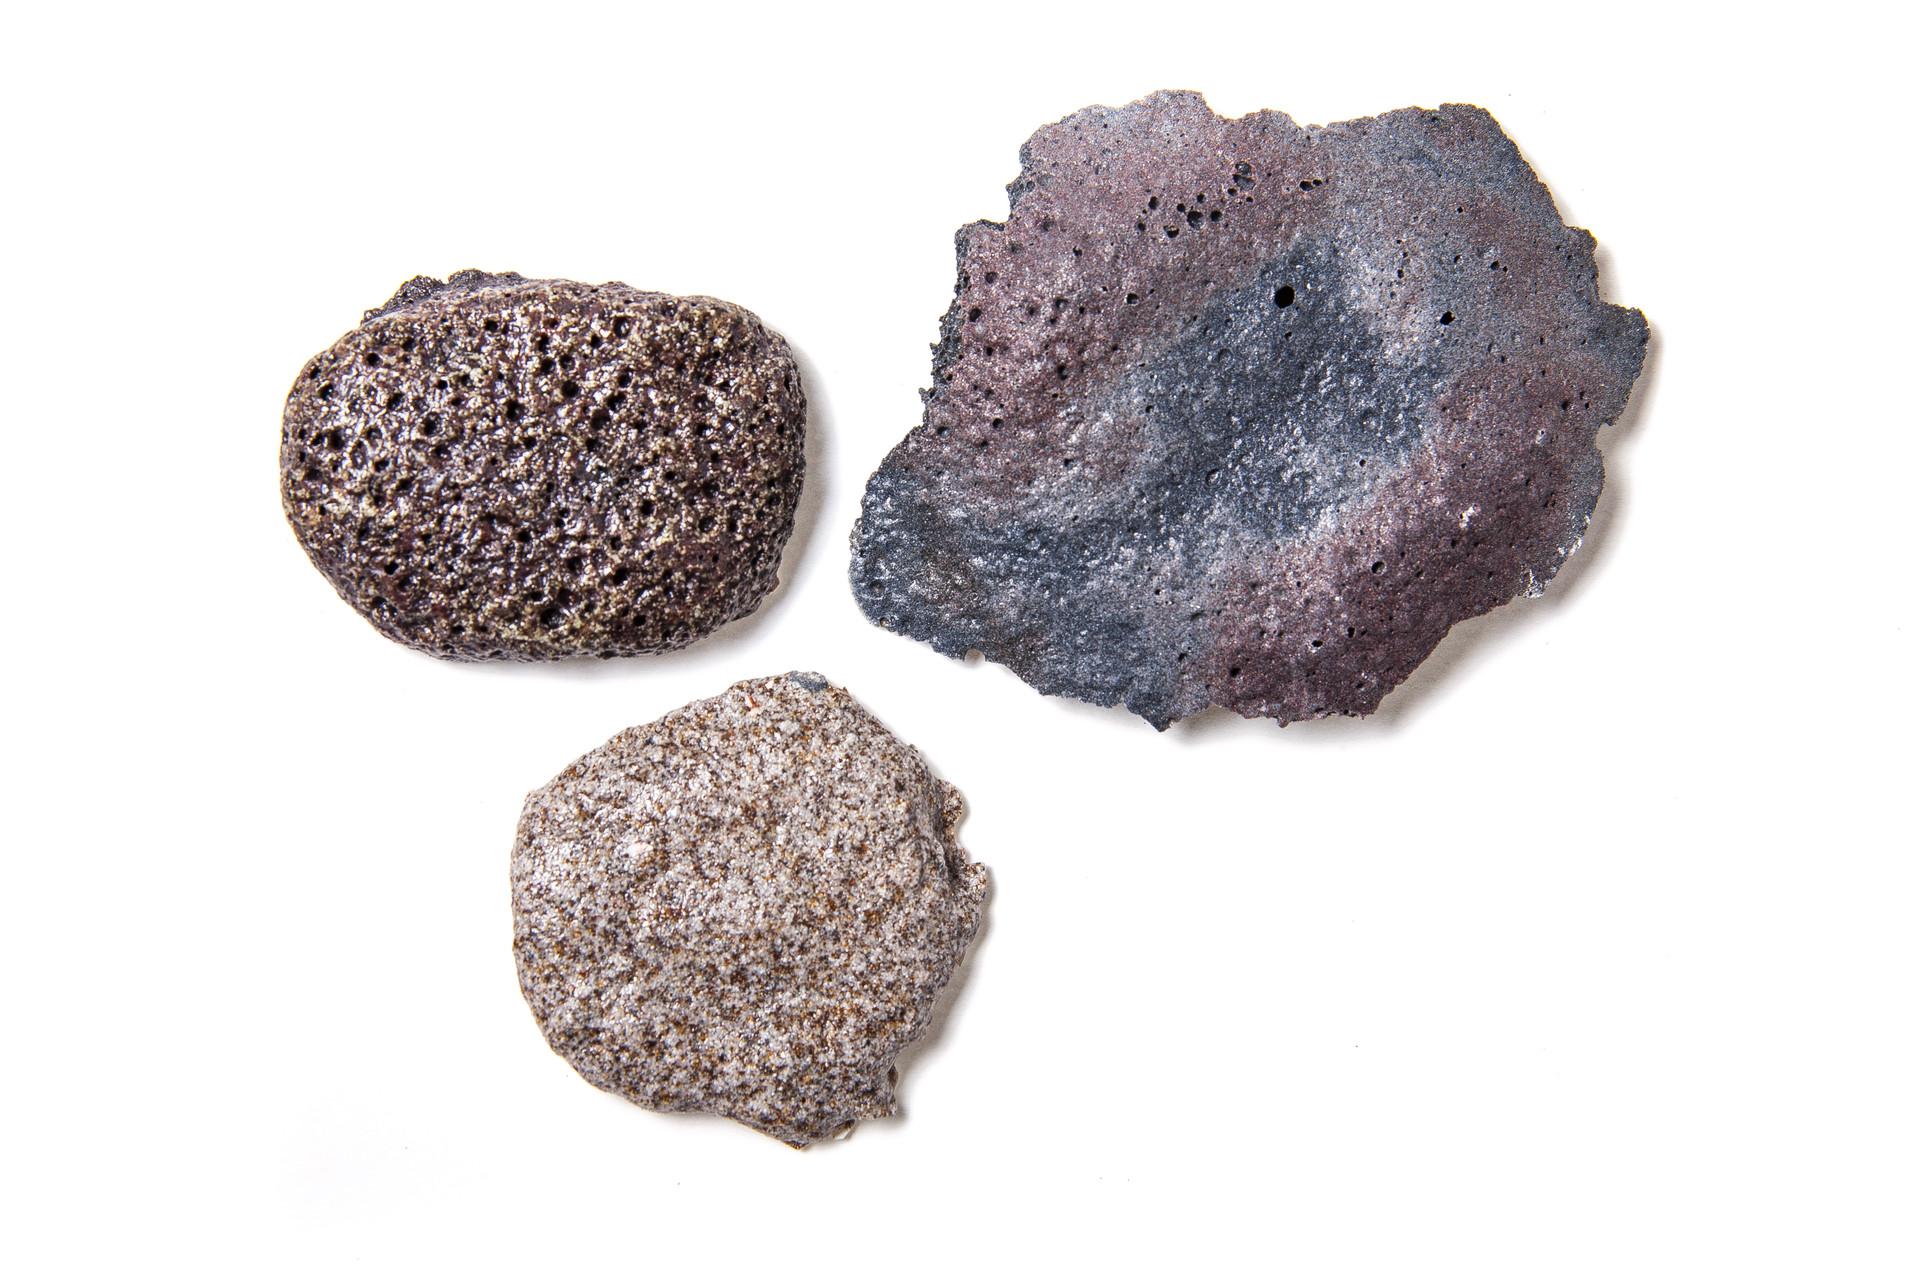 Caroborondum Material Samples